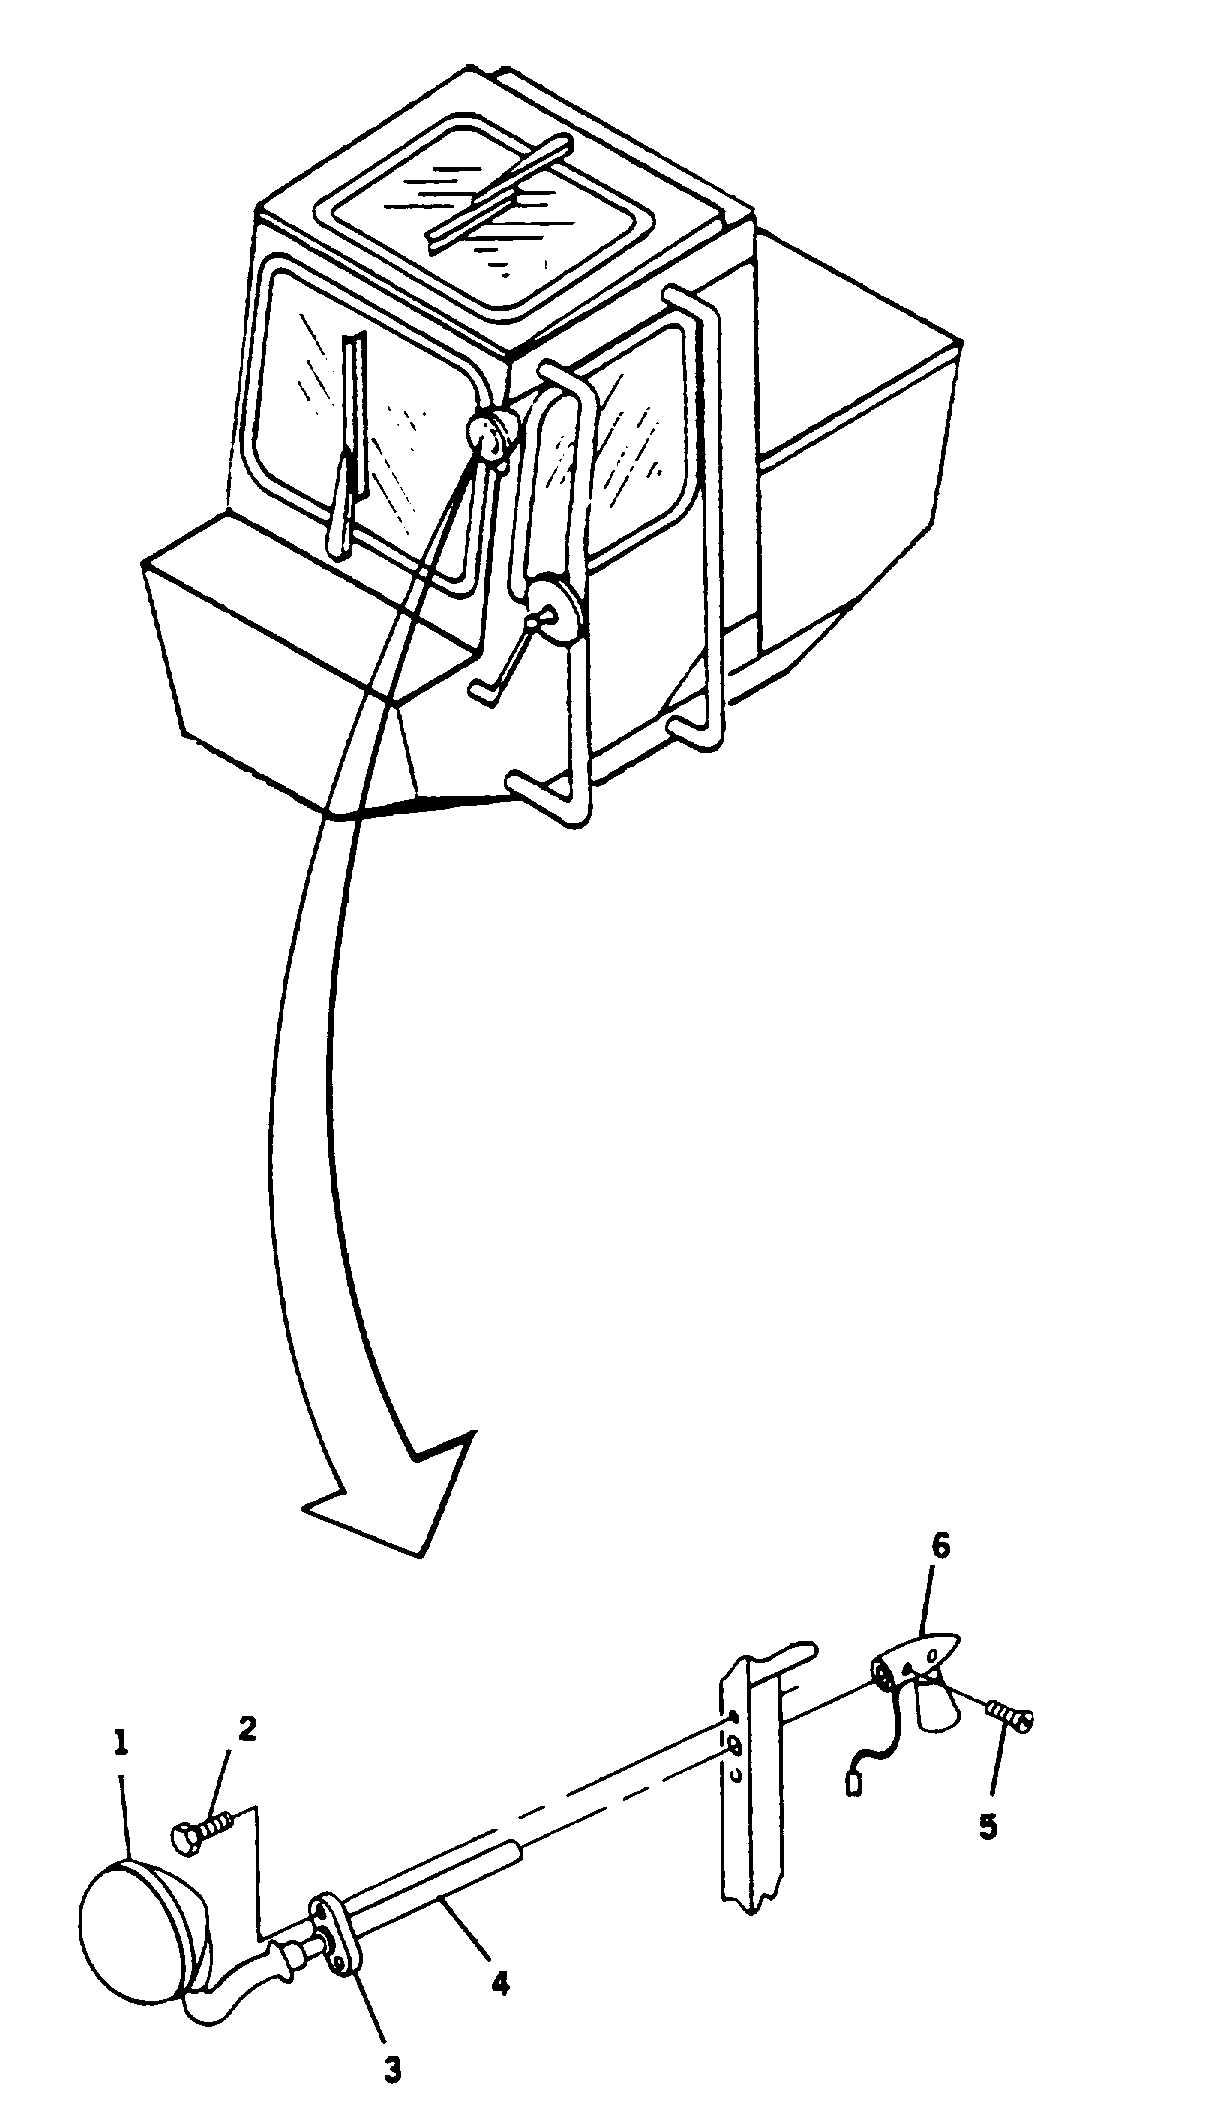 Electrical Tool Kit